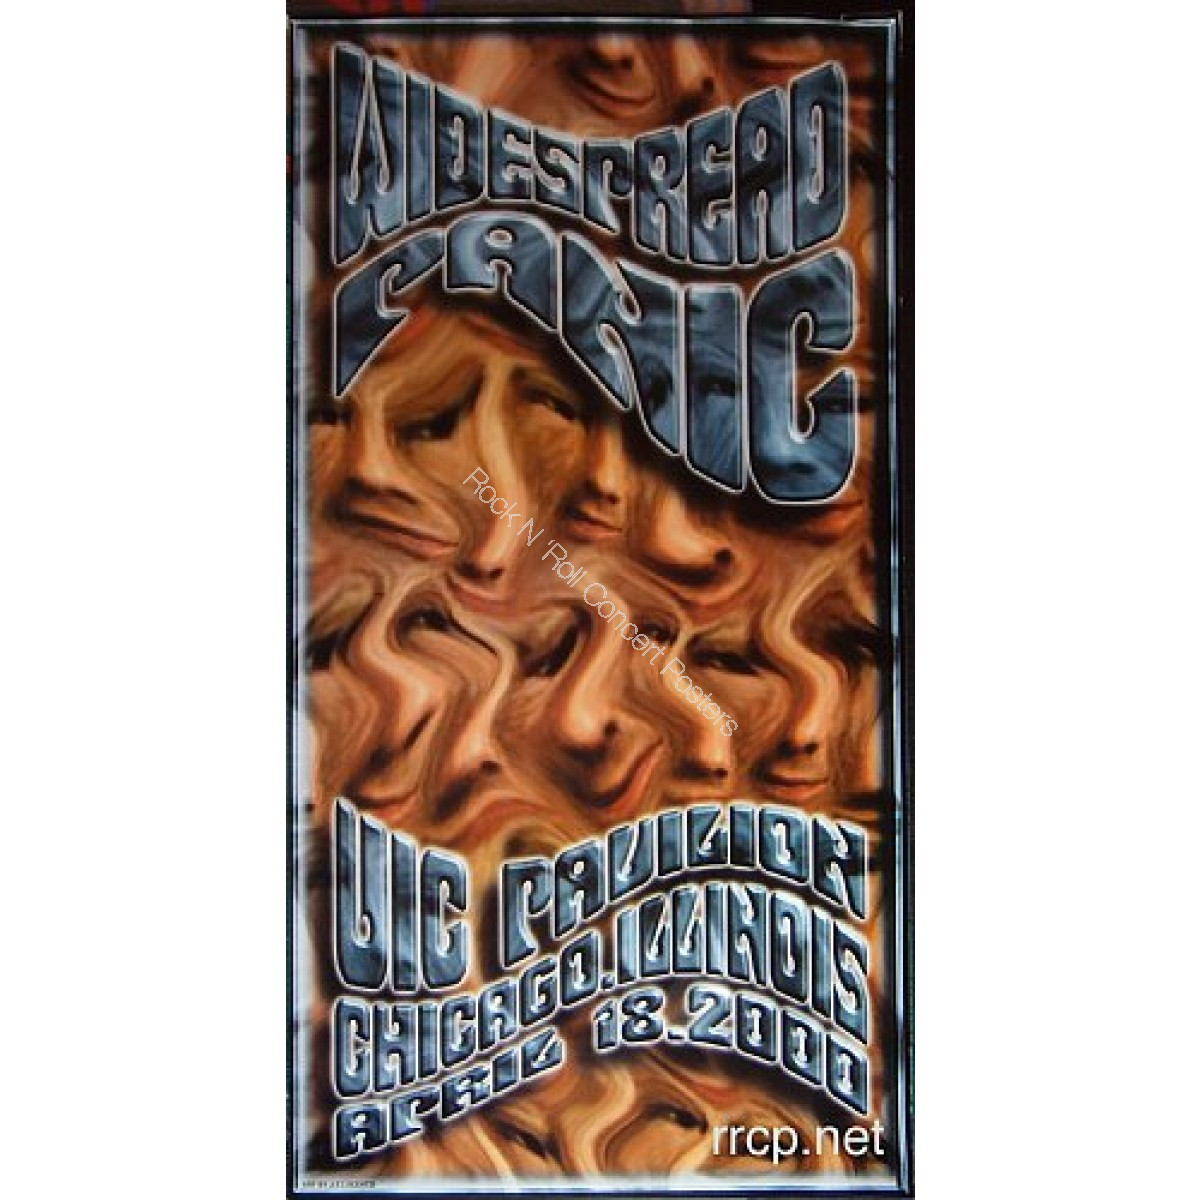 Widespread Panic UIC Pavillion Chicago 4/18/00